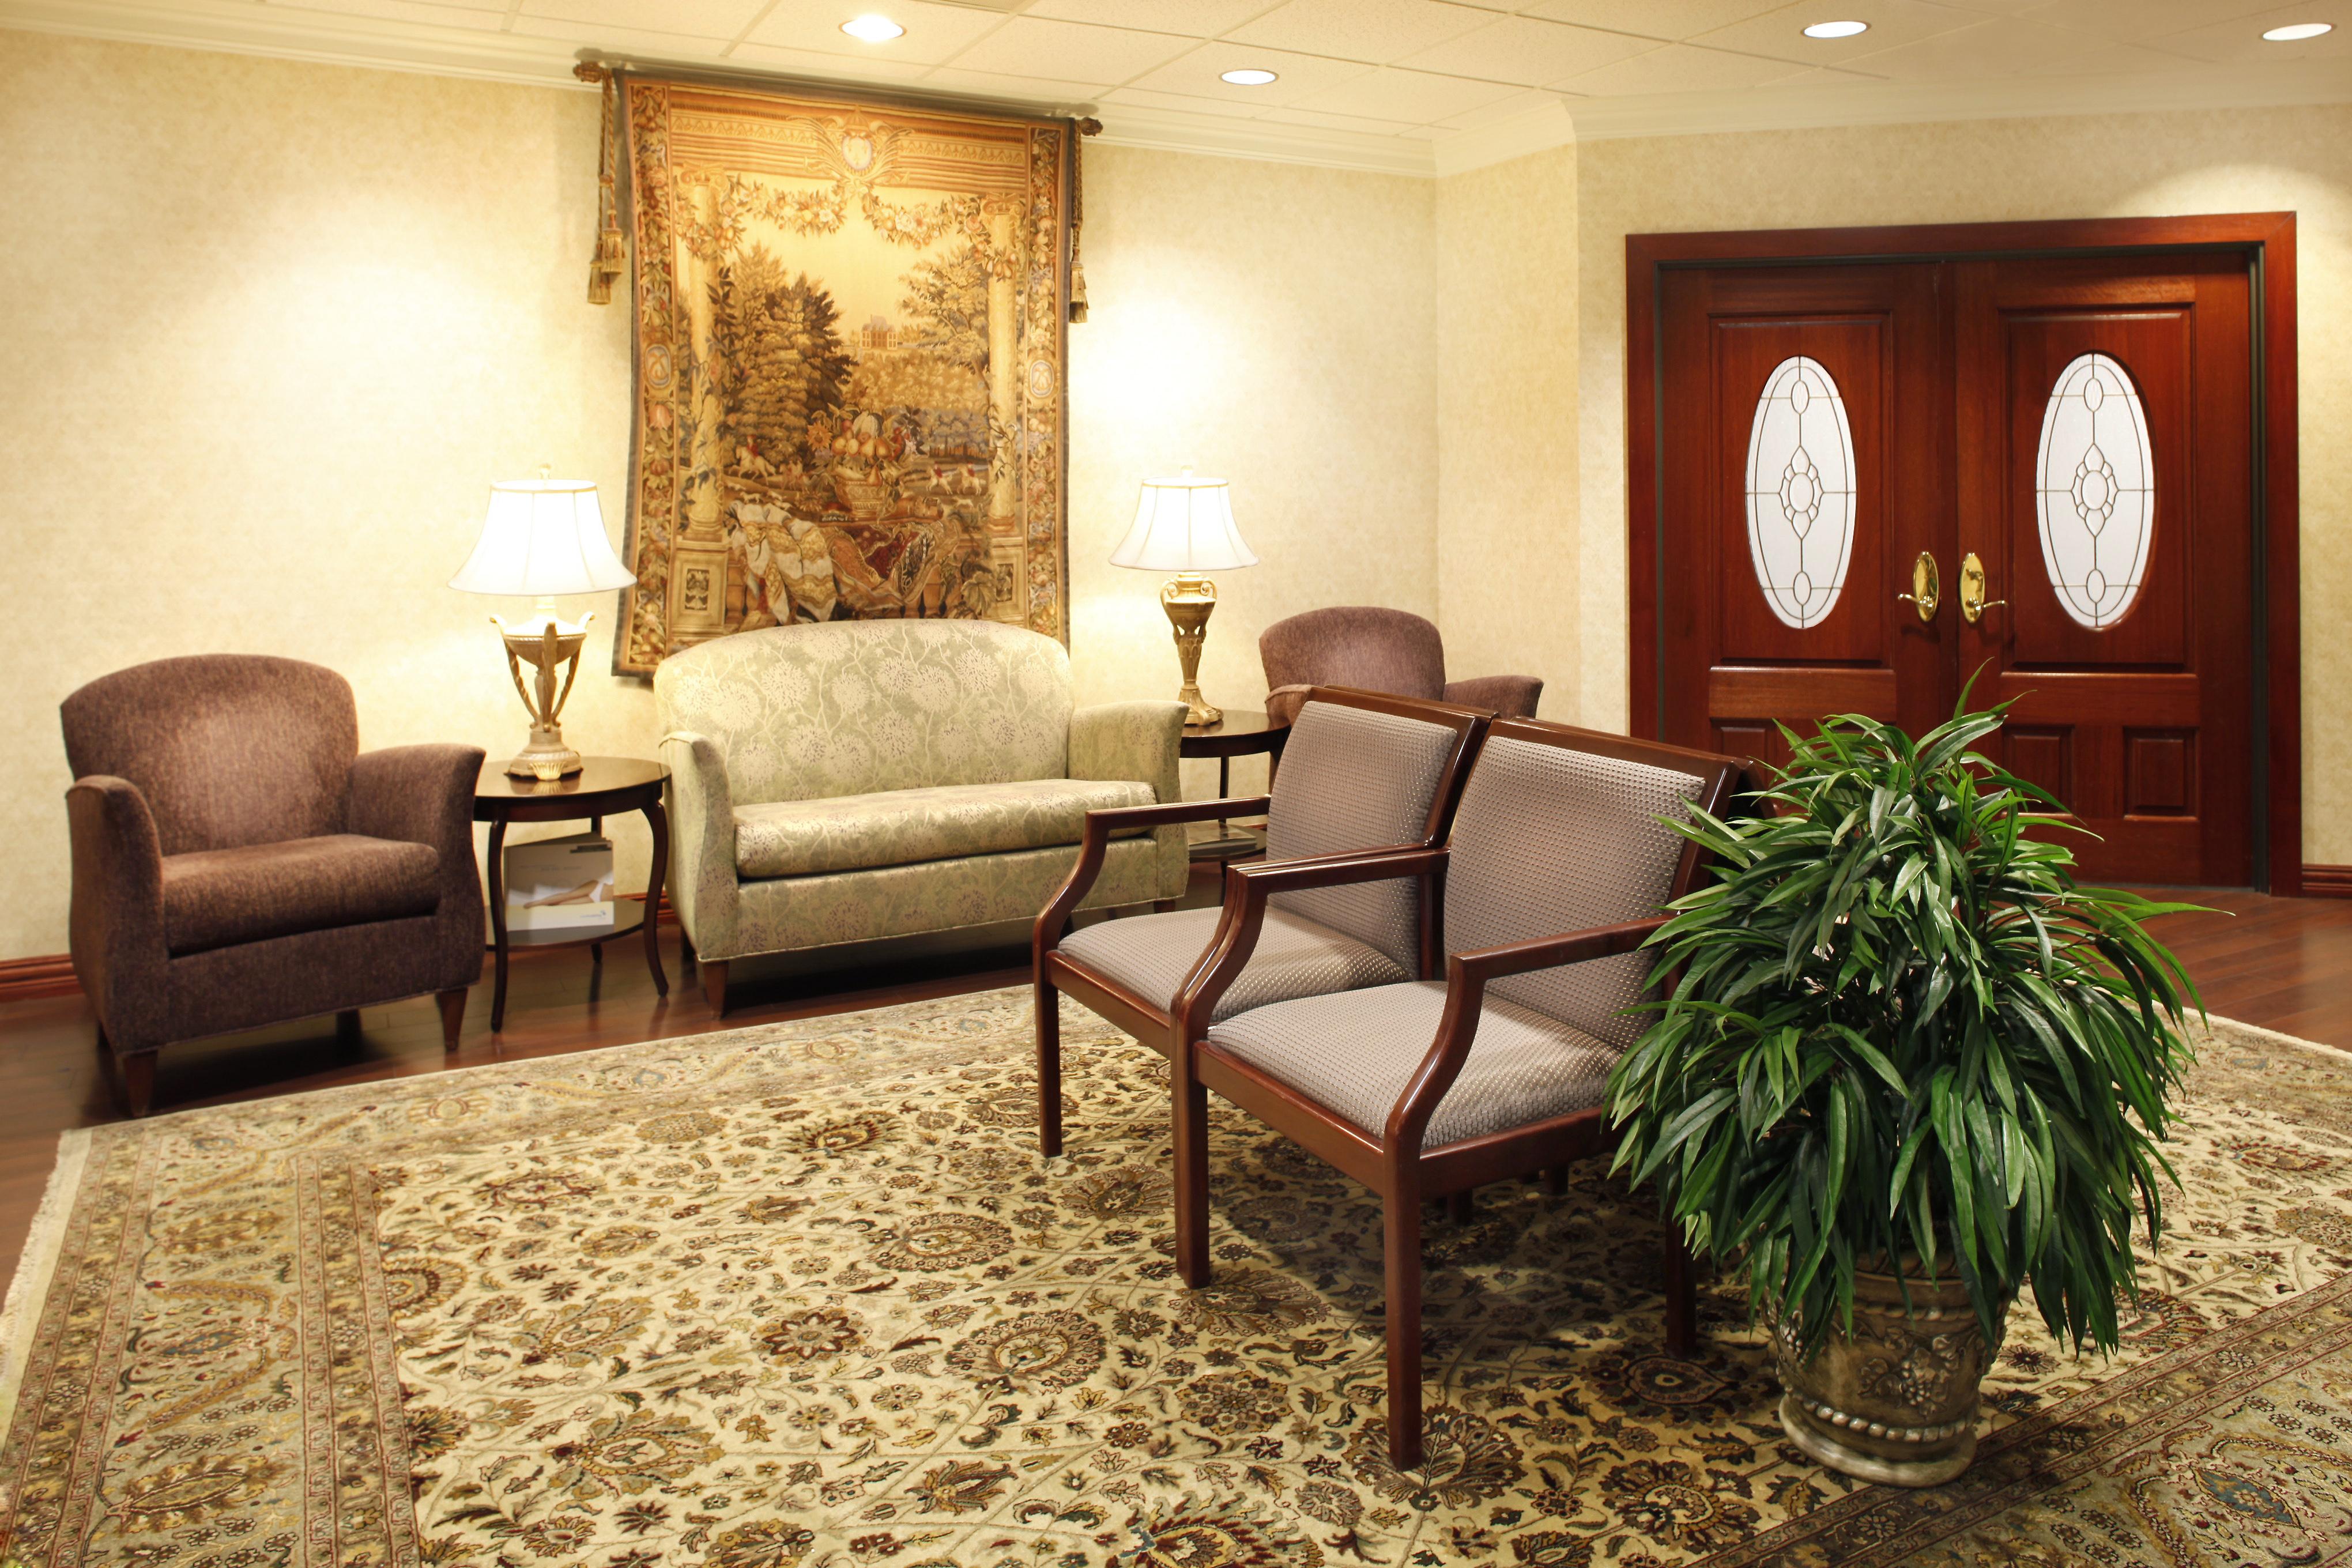 Dallas Center For Dermatology And Aesthetics (Dallas, TX) - #0